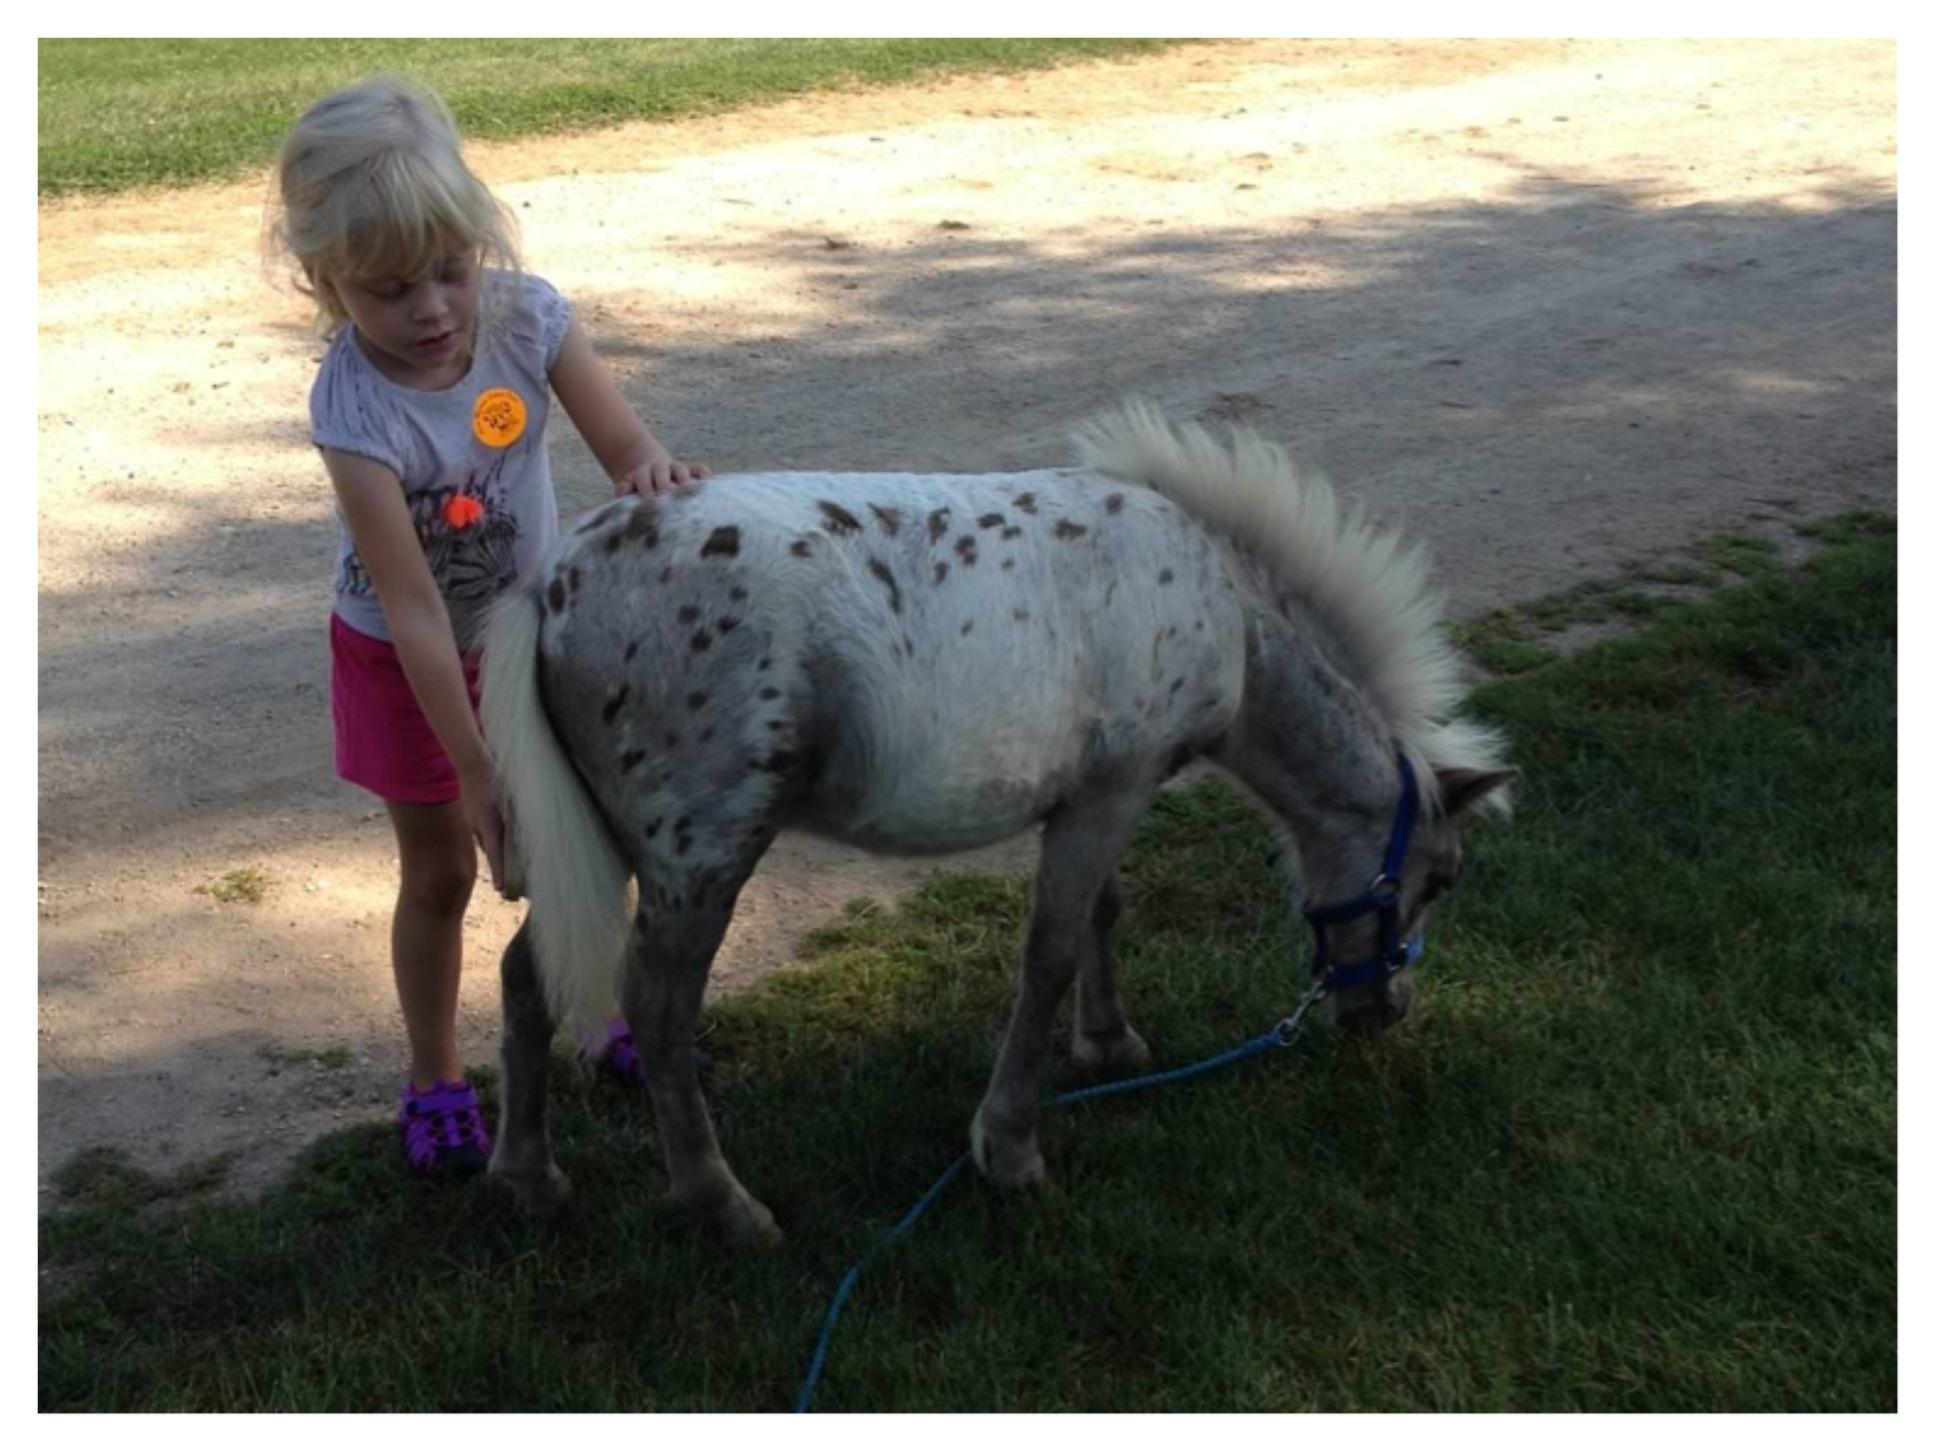 Brynley and pony.jpg